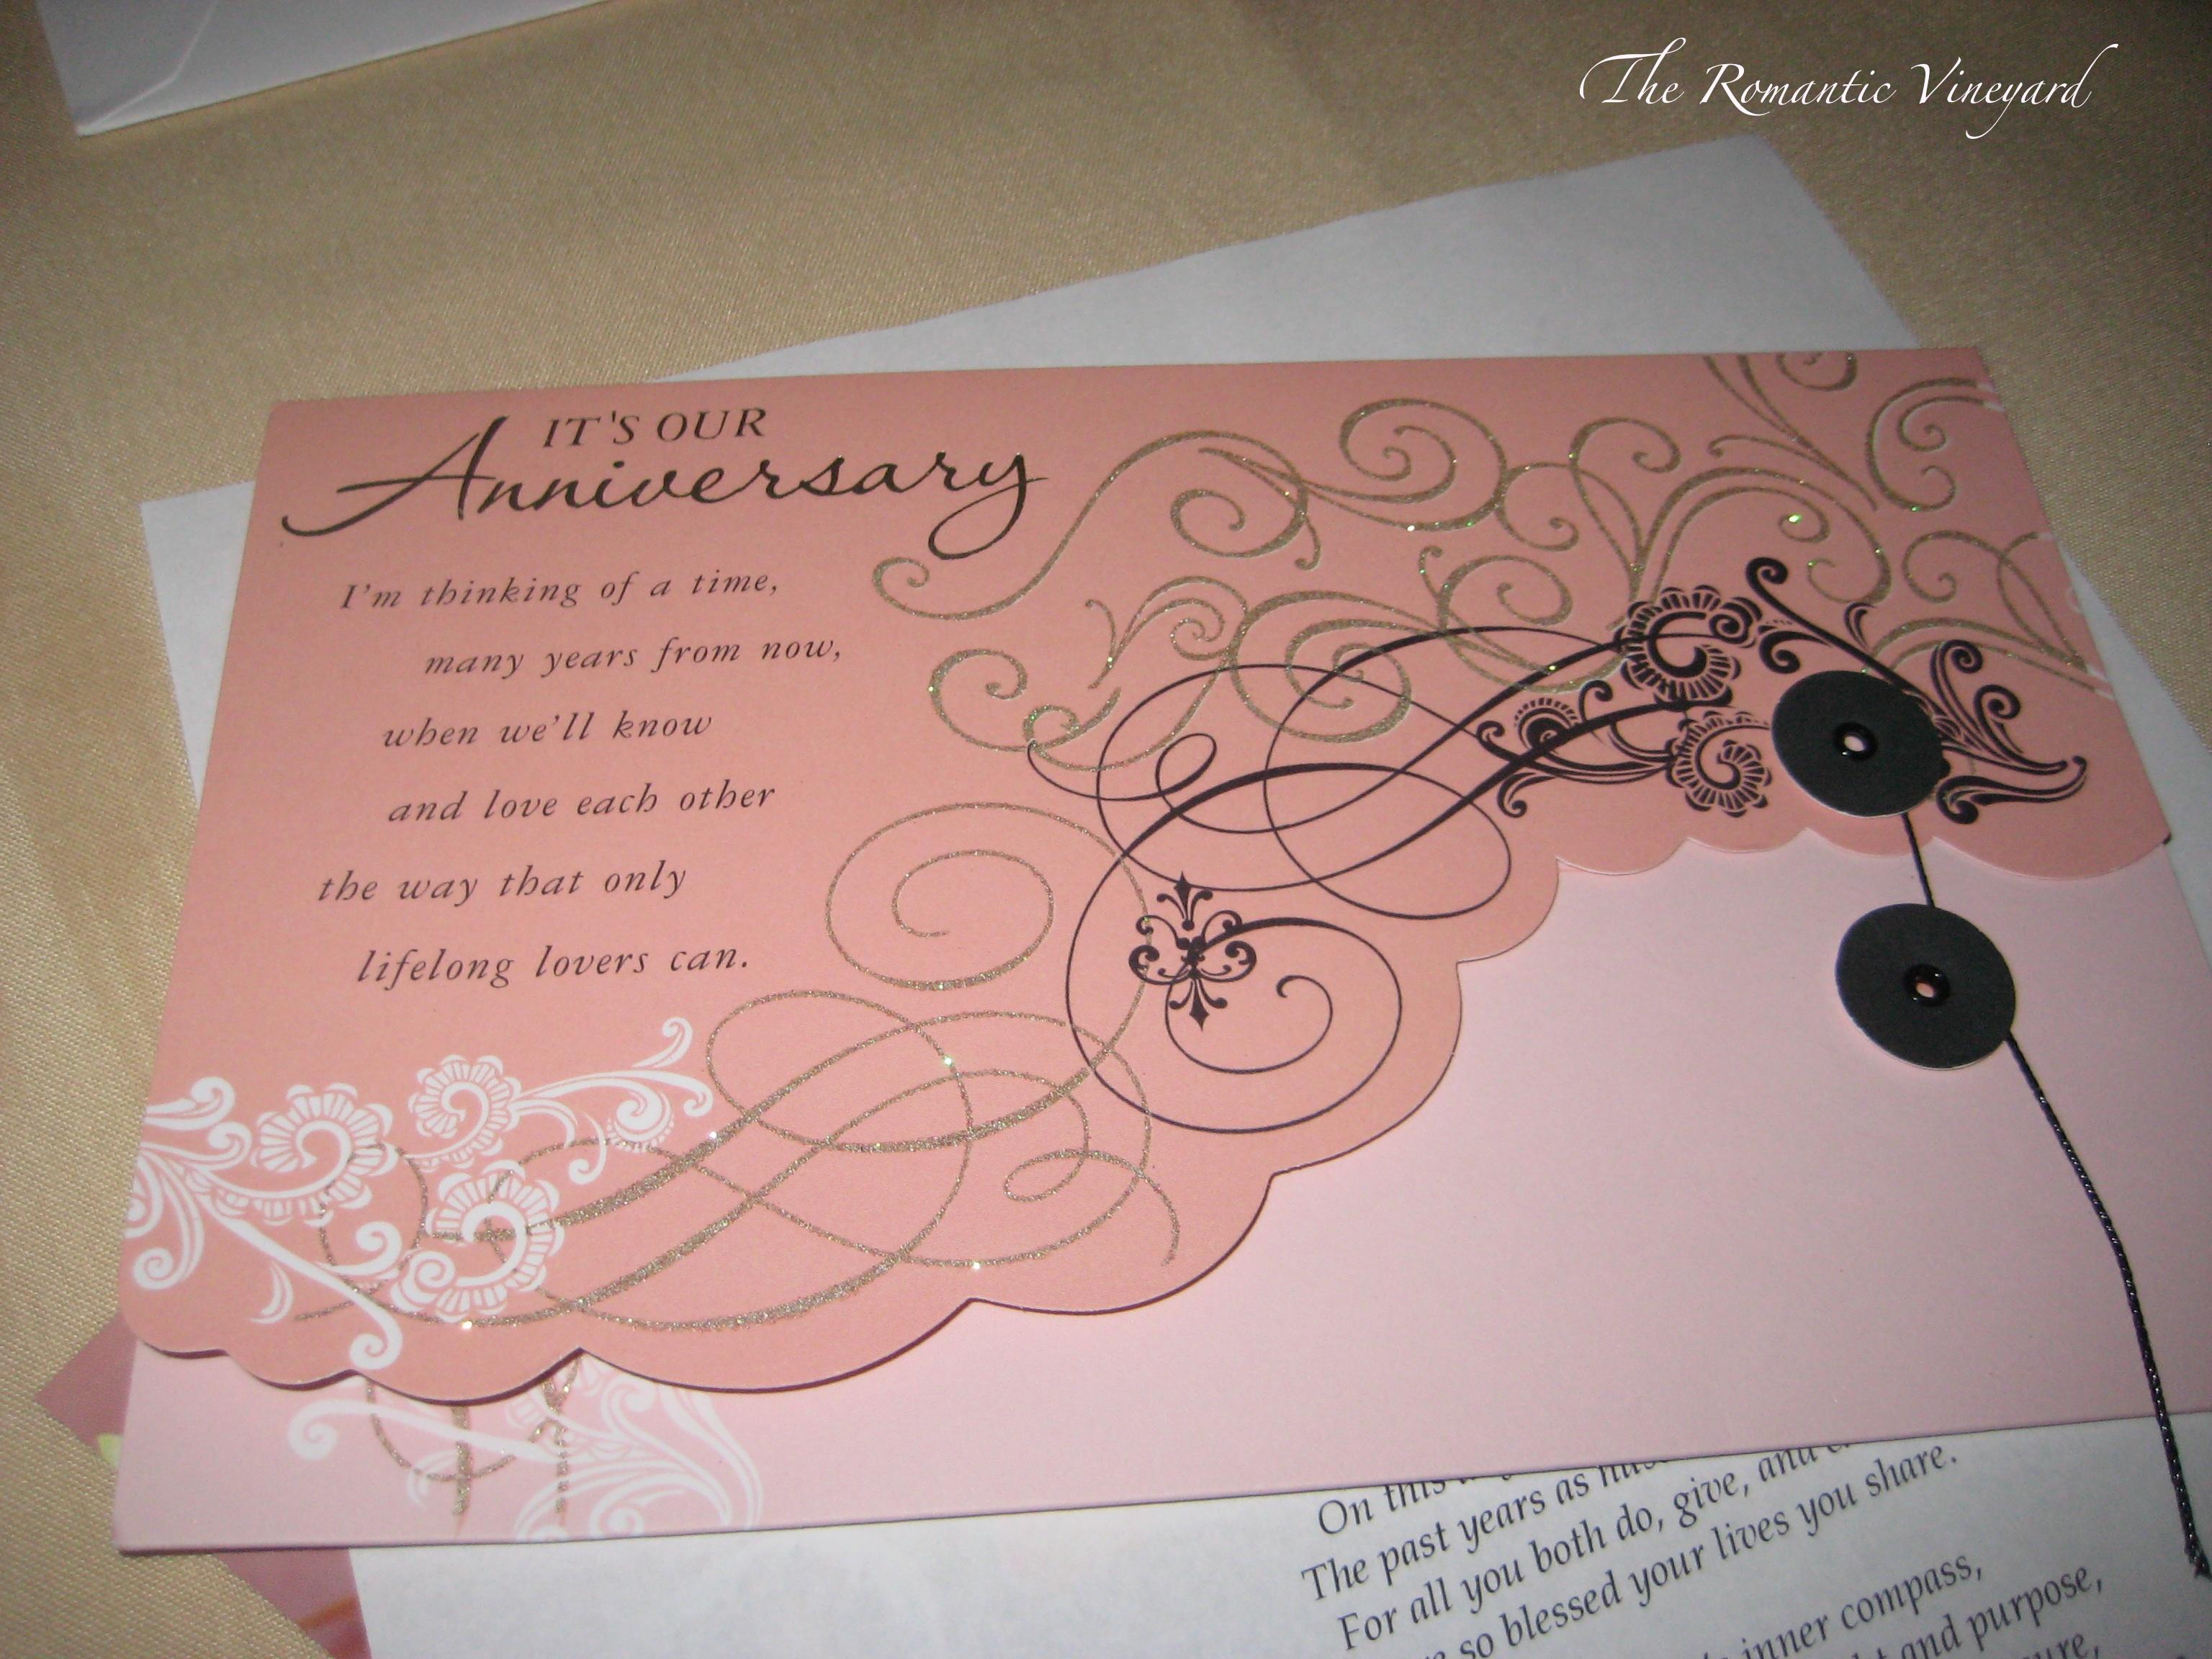 Mark your calendar the romantic vineyard